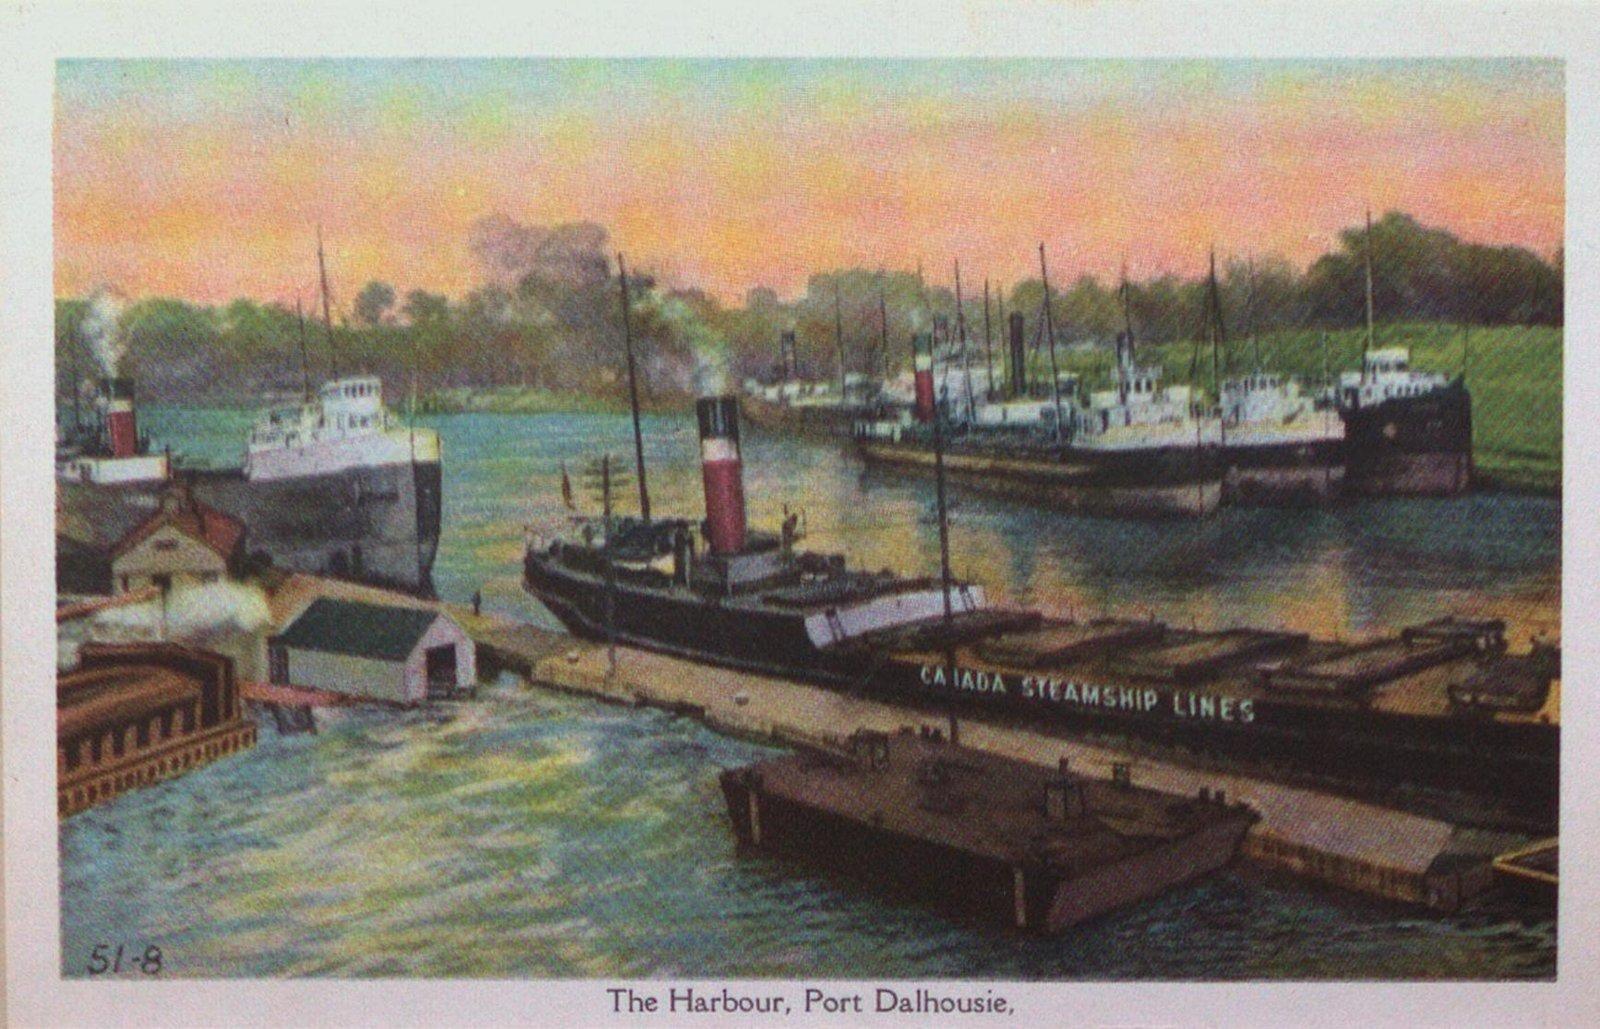 Souvenir view of St. Catharines & Port Dalhousie: The Harbour, Port Dalhousie